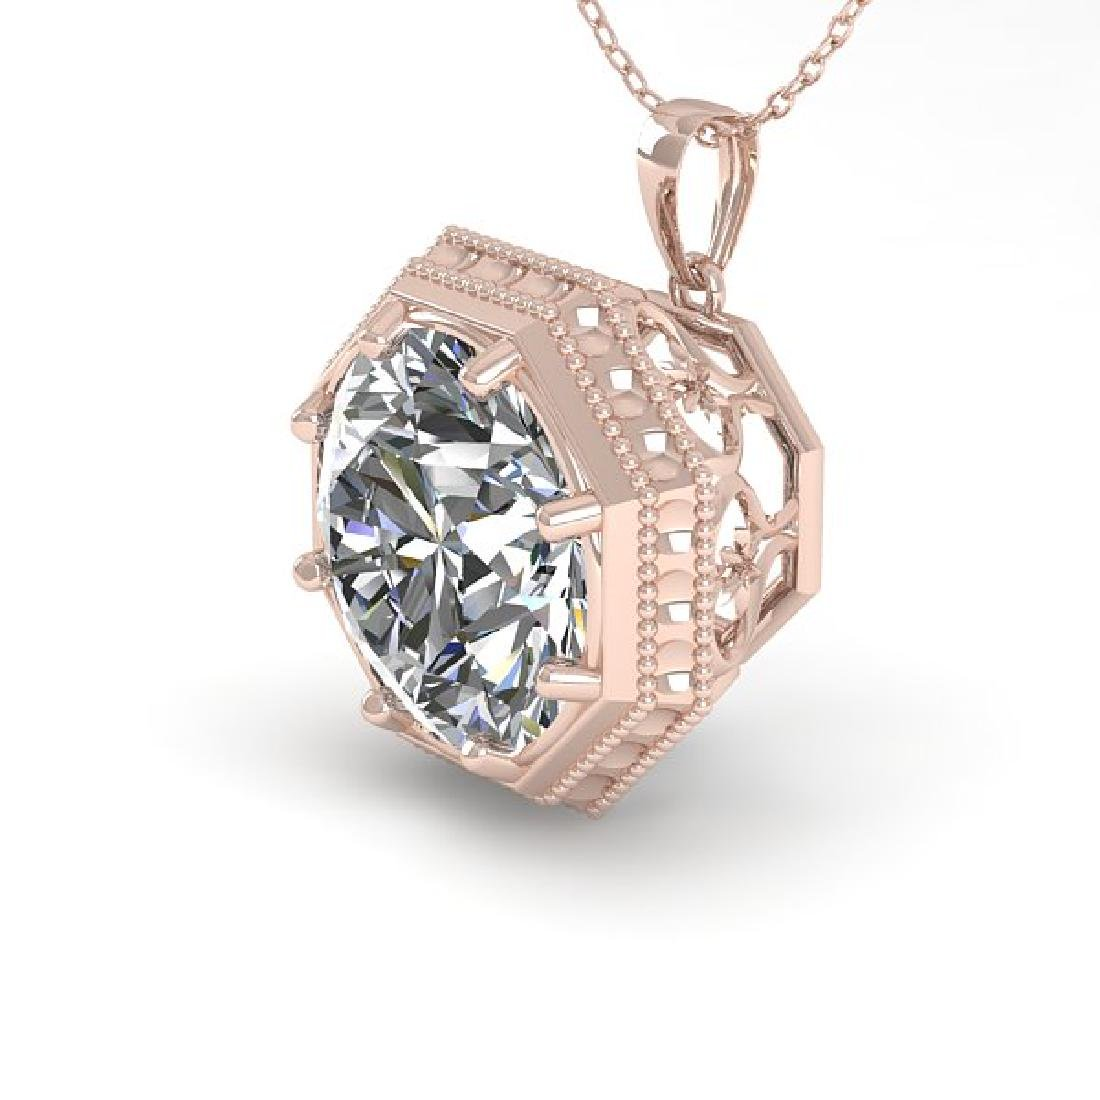 1.50 CTW Certified VS/SI Diamond Necklace 14K Rose Gold